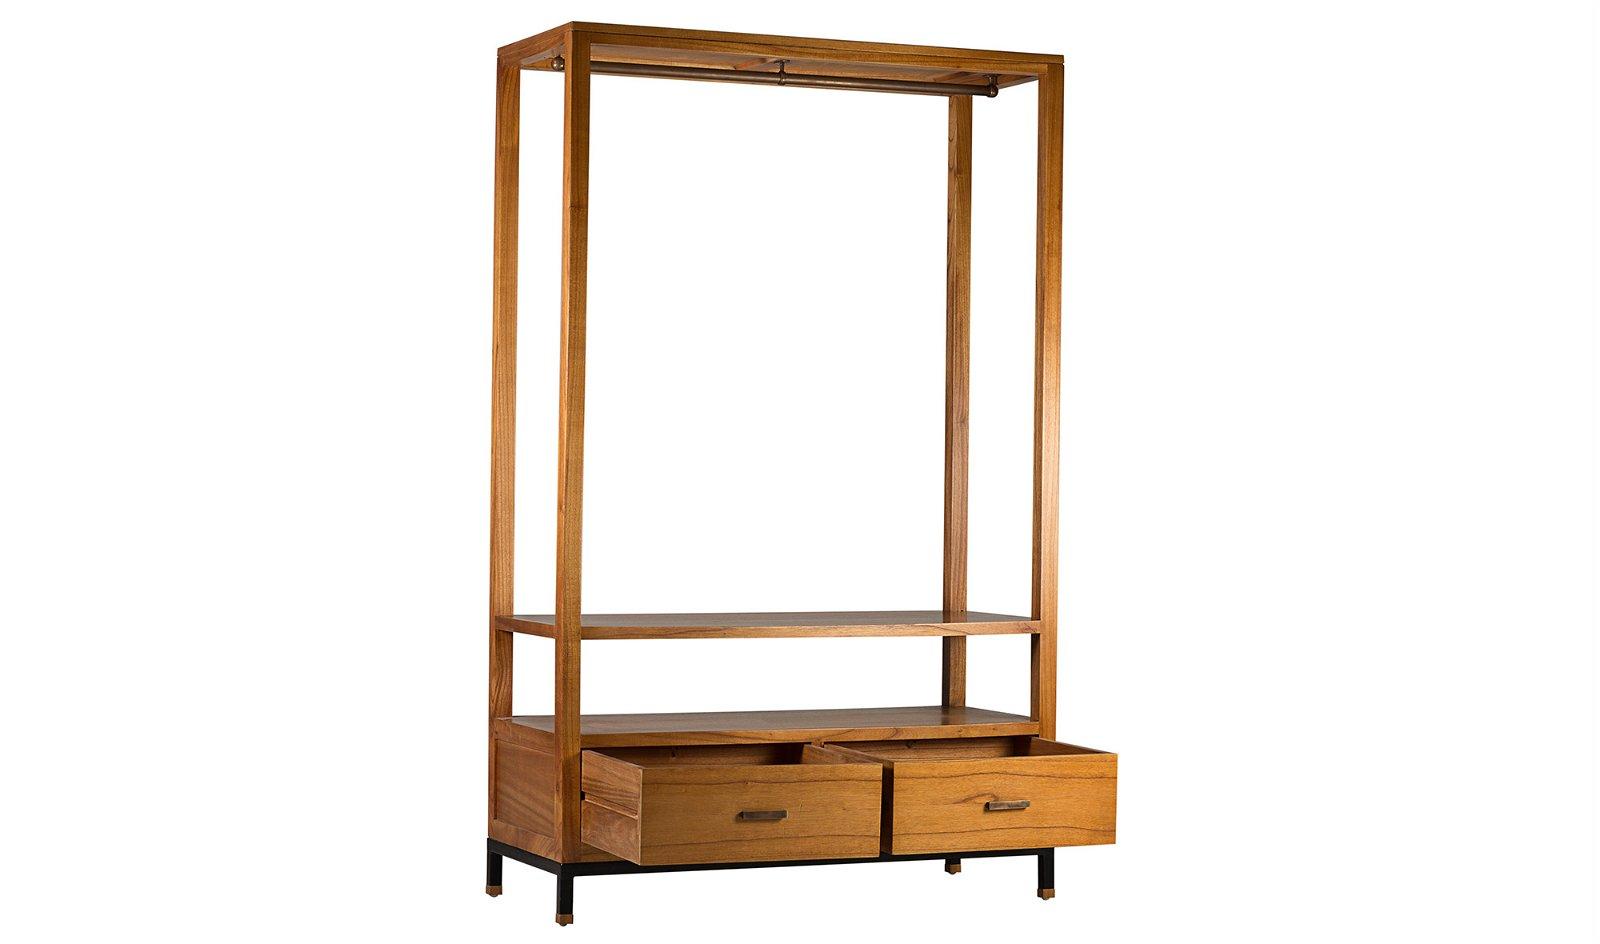 Mueble auxiliar colgador 2 cajones industrial Madhu